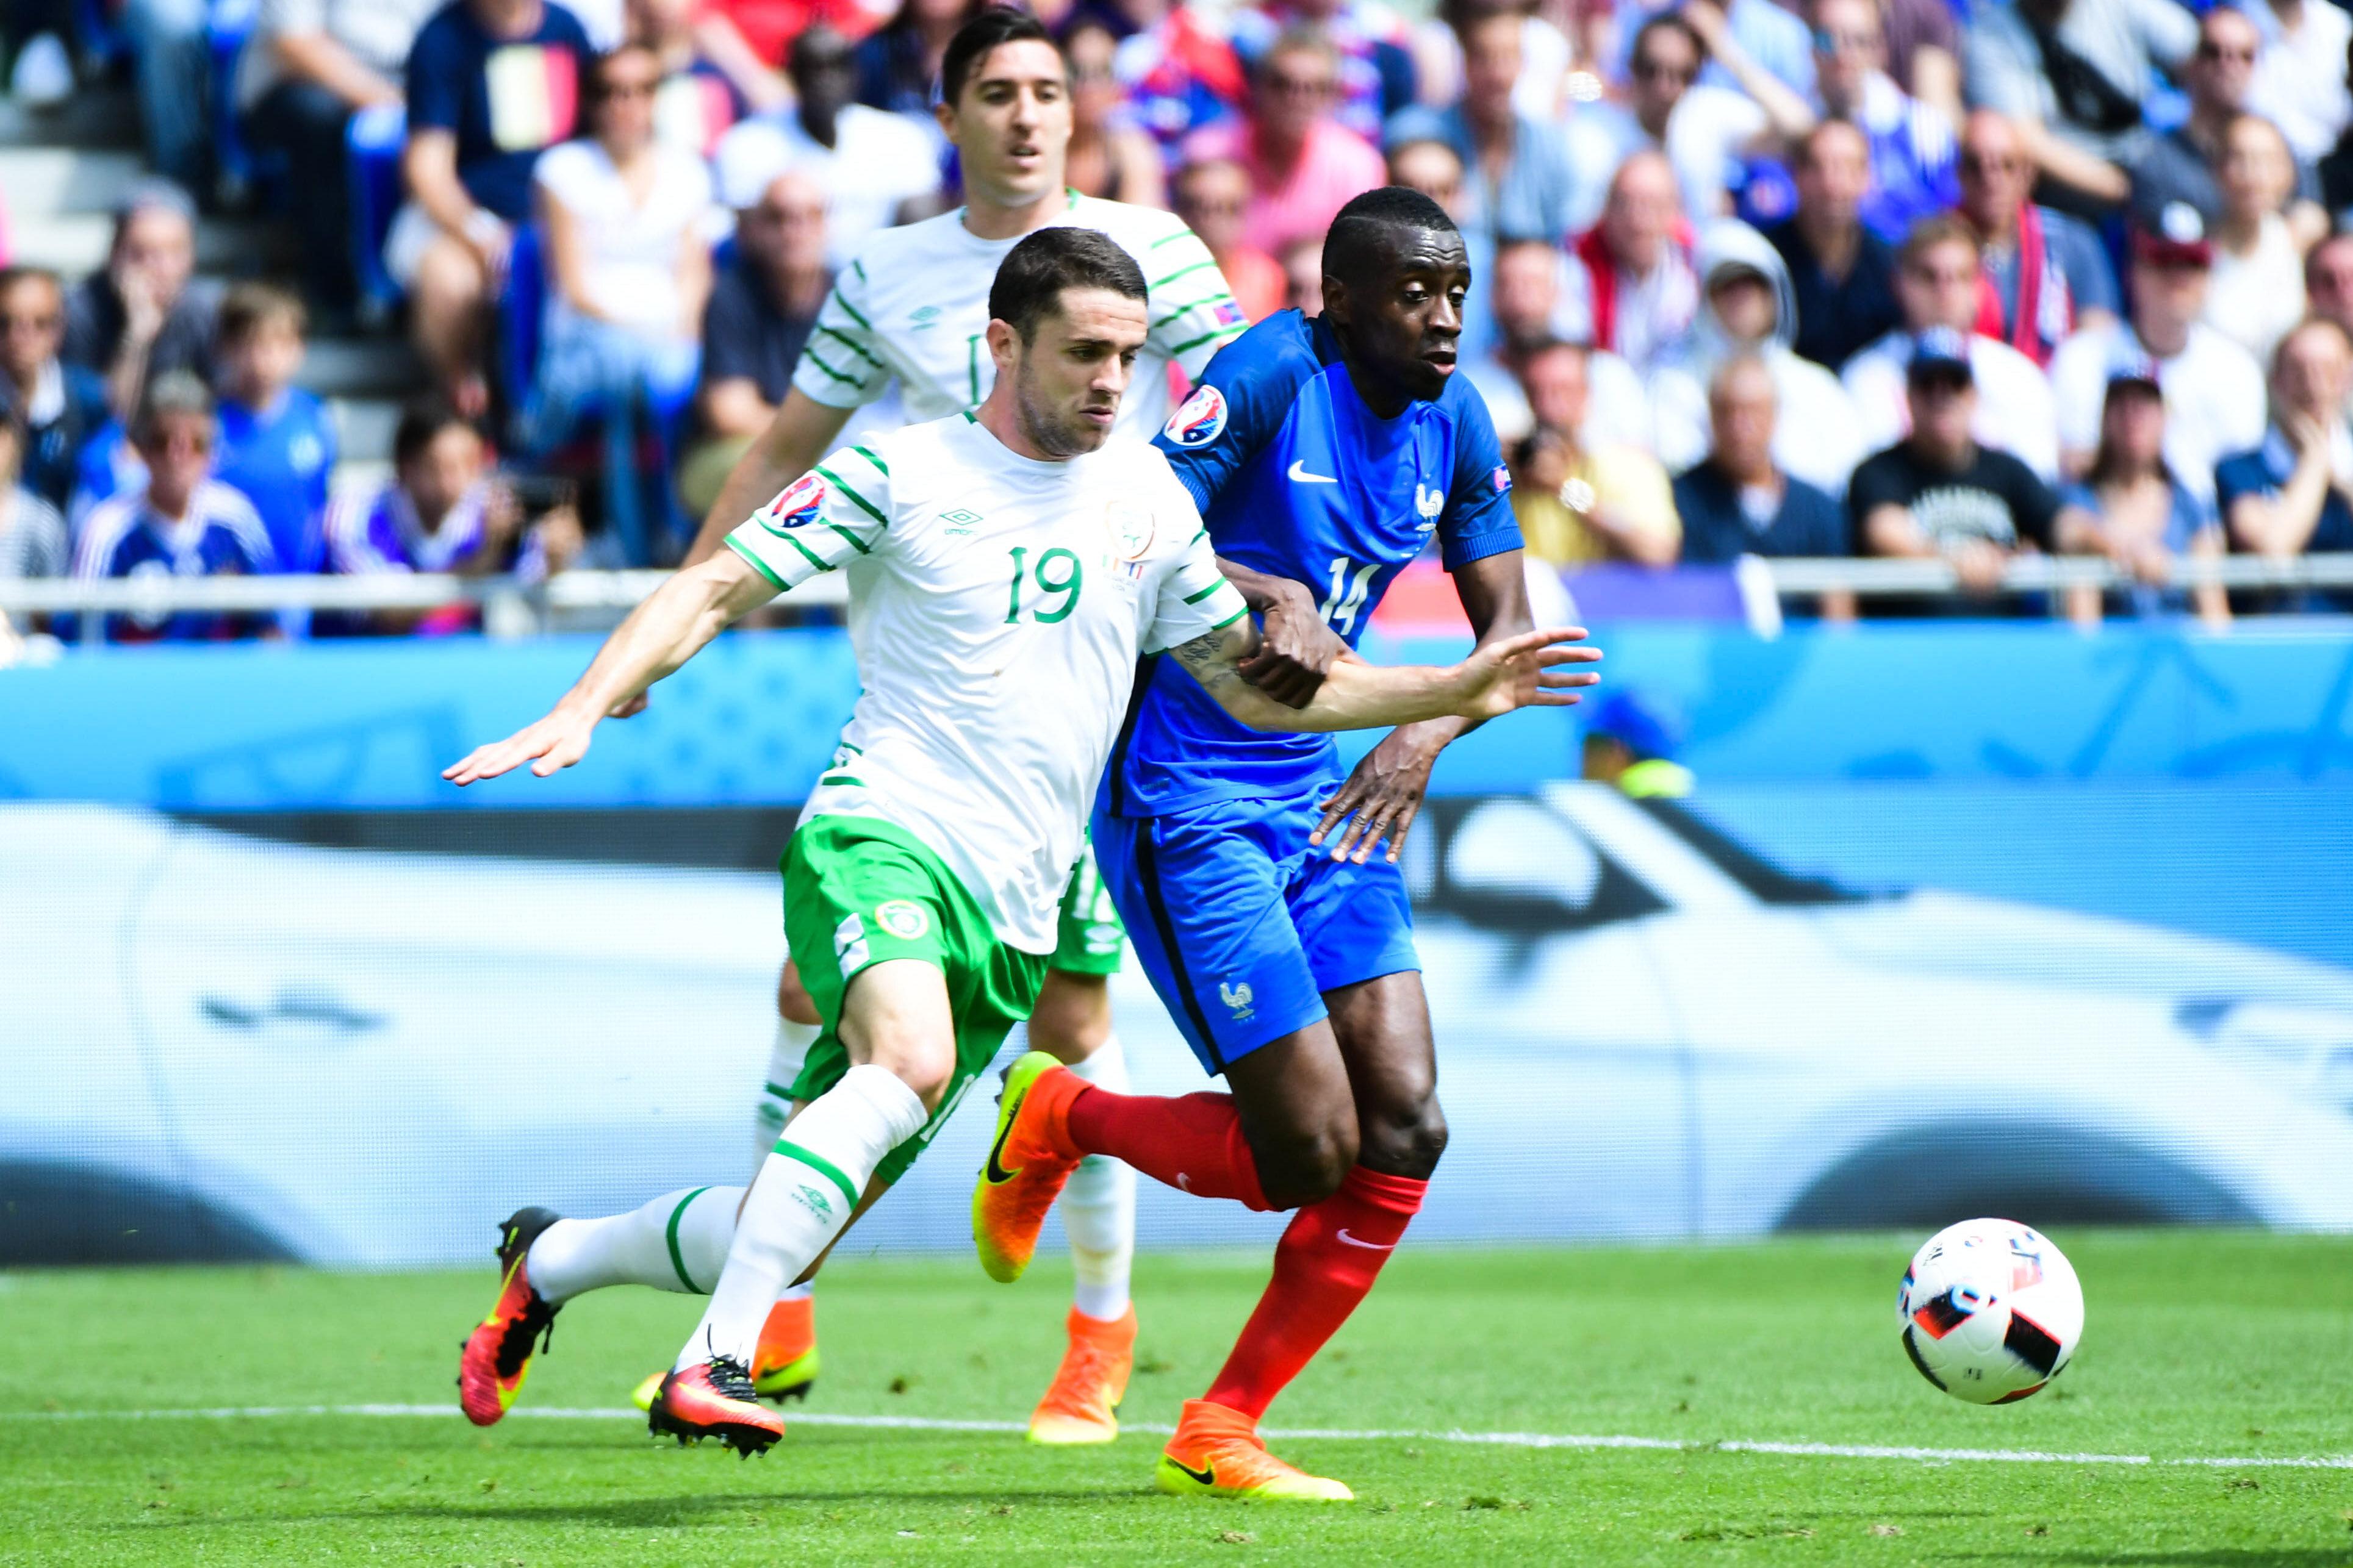 Mecz Francja - Irlandia